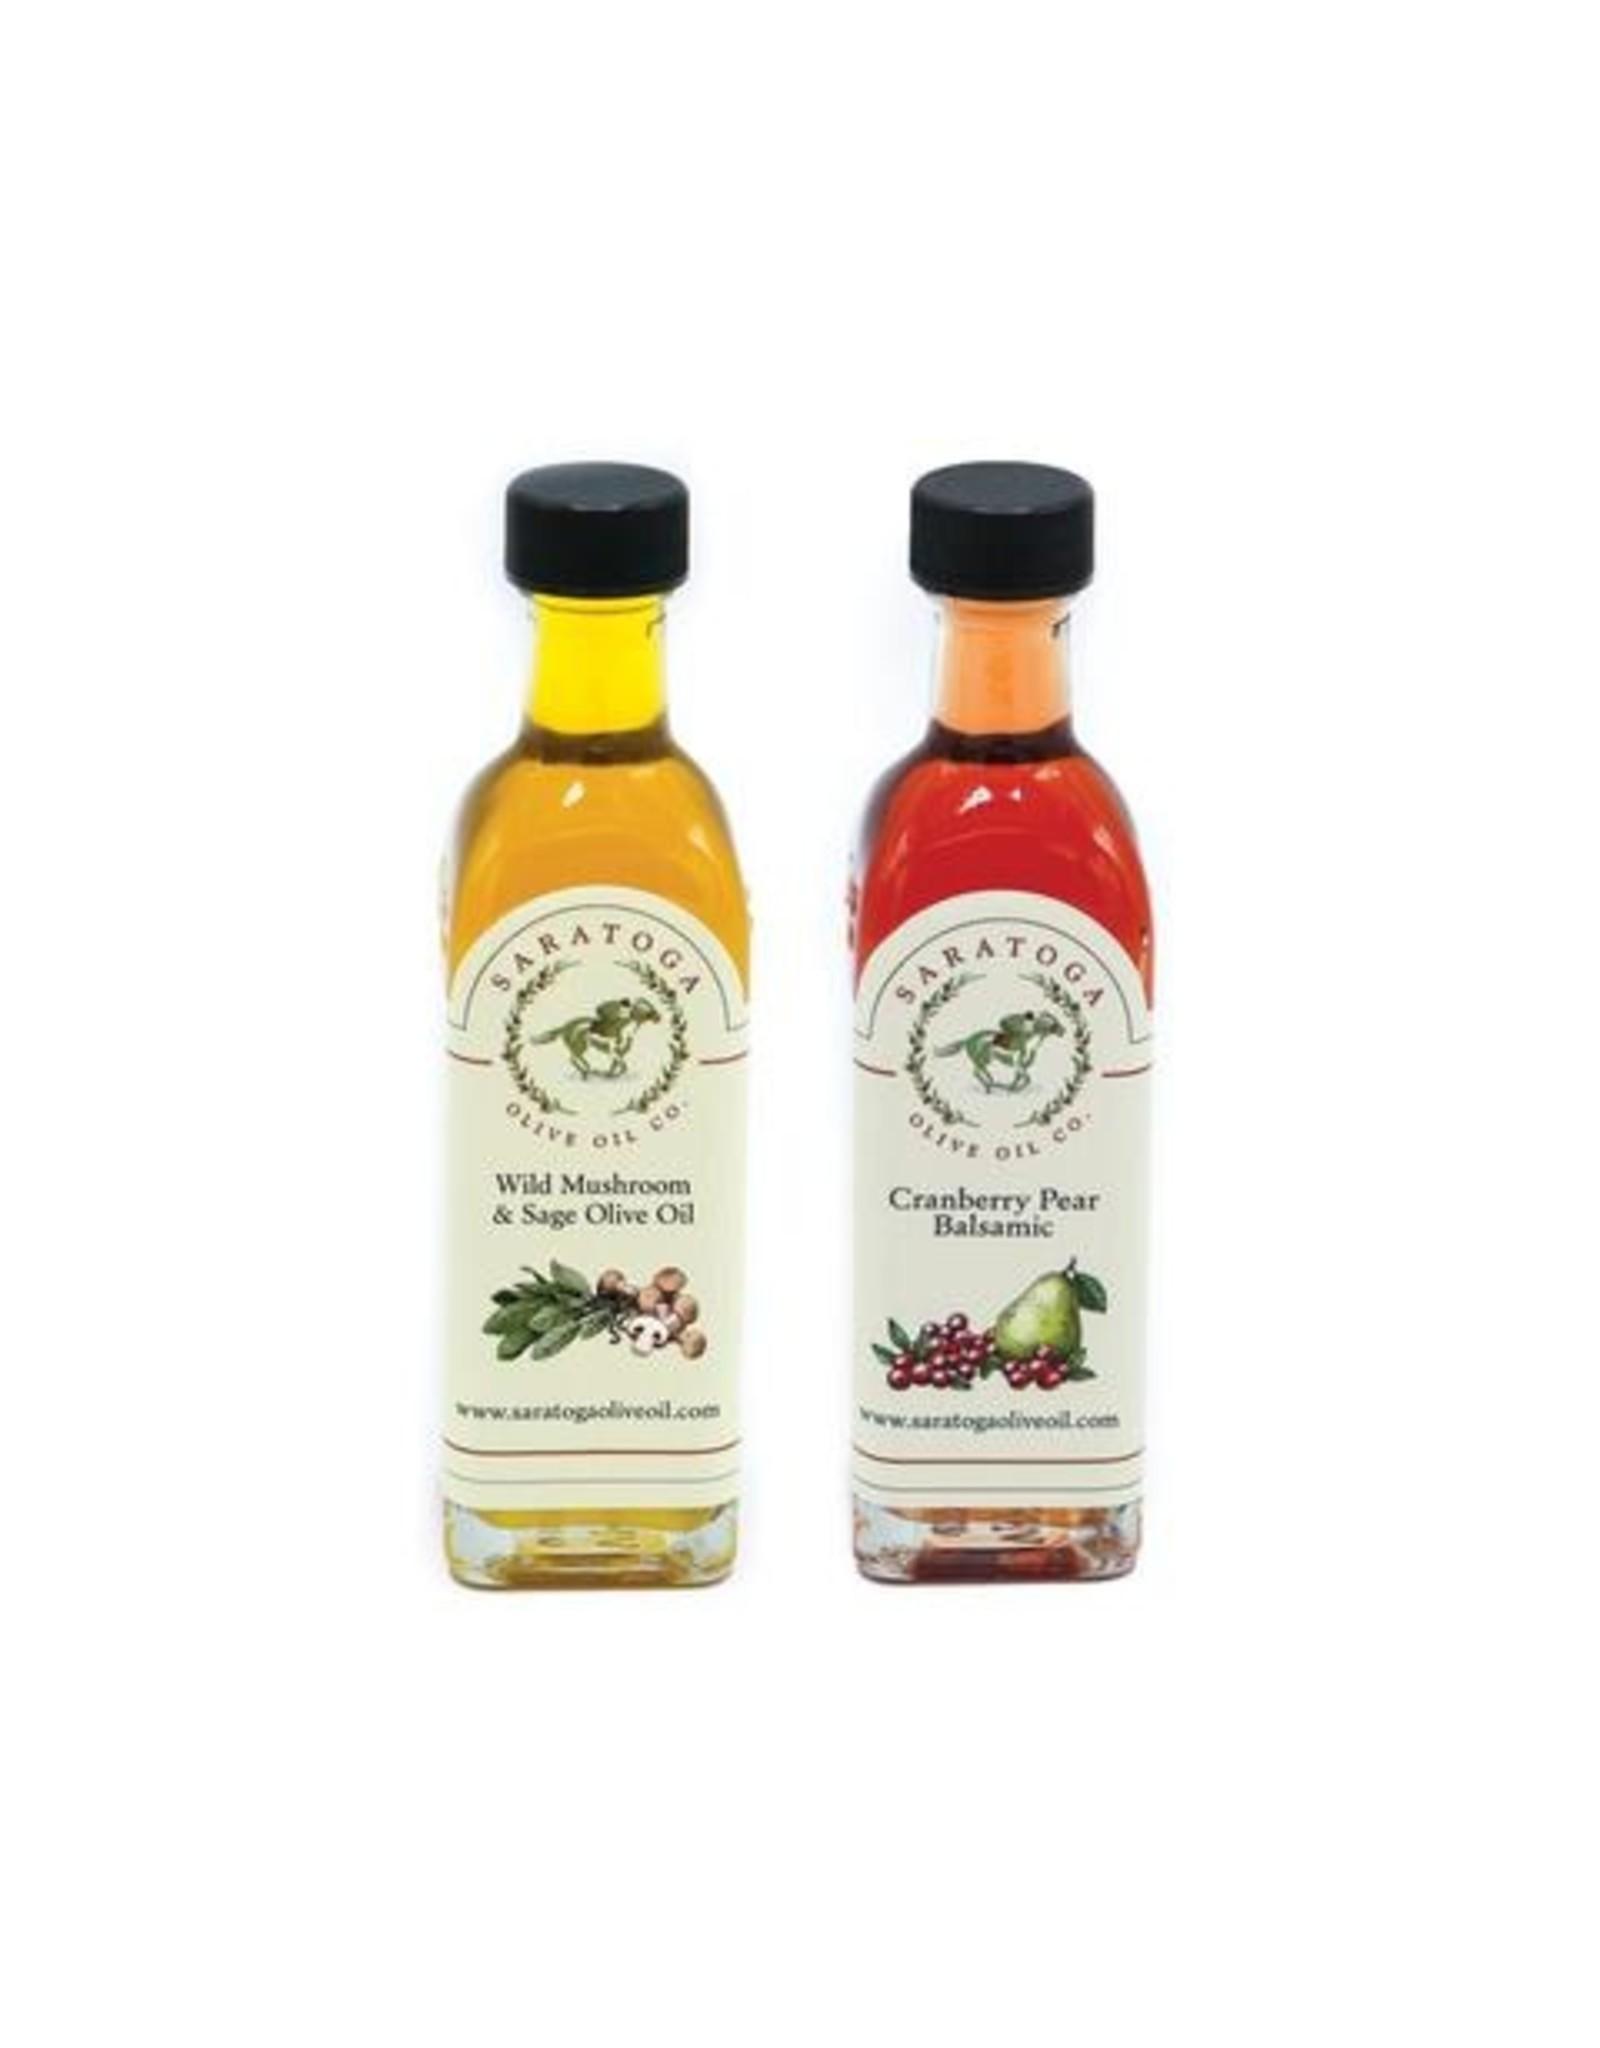 Saratoga Olive Oil Company Cranberry Pear Balsamic